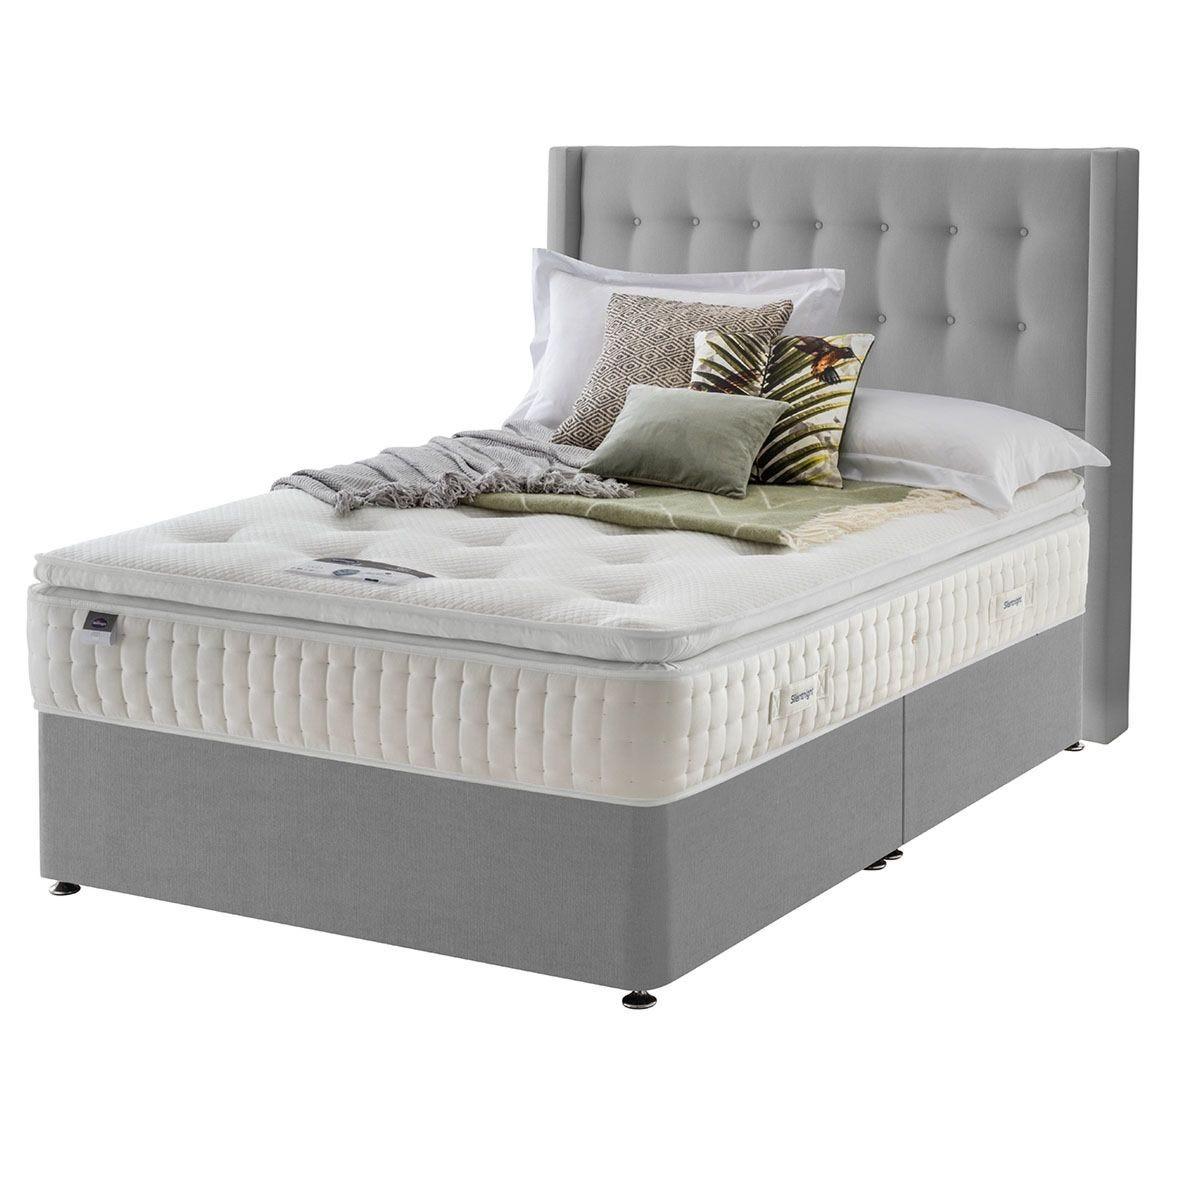 Silentnight Mirapocket Latex 1400 Non Storage Divan Bed - Grey Double